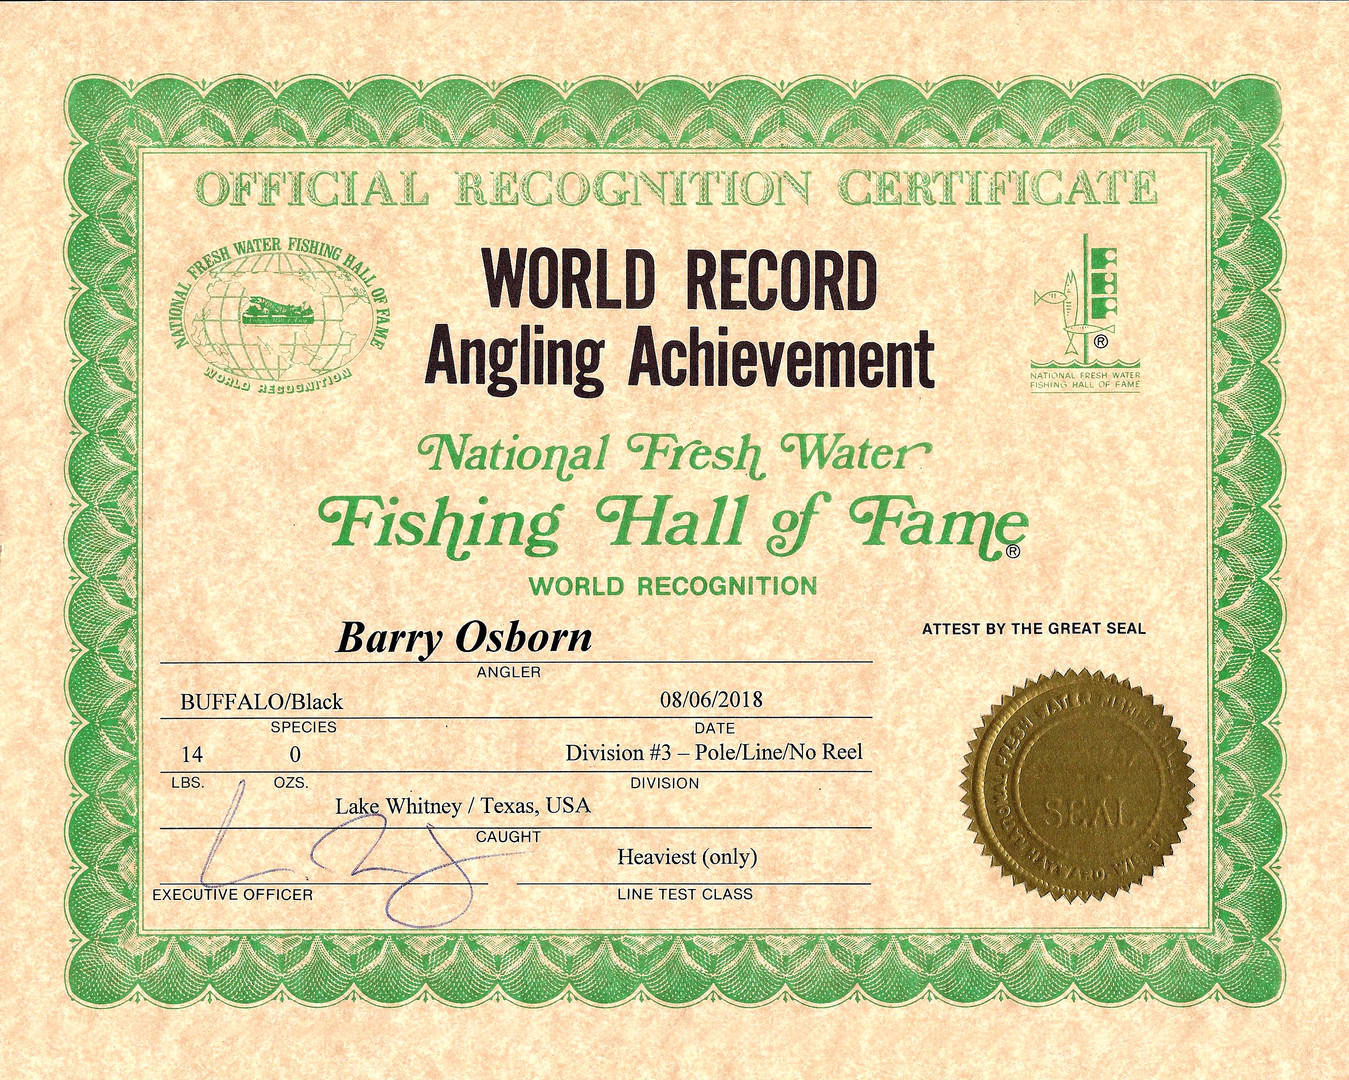 Plnor Black Buffalo World Record Certificate